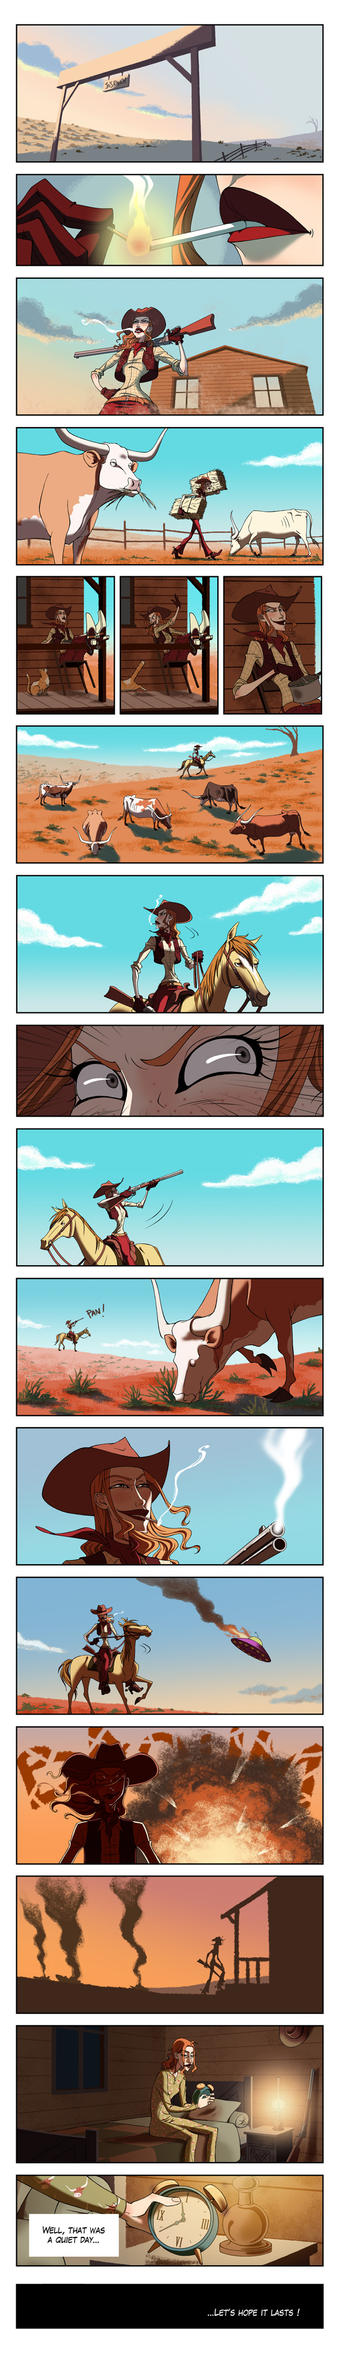 Jo strip 01 by JackPot-84